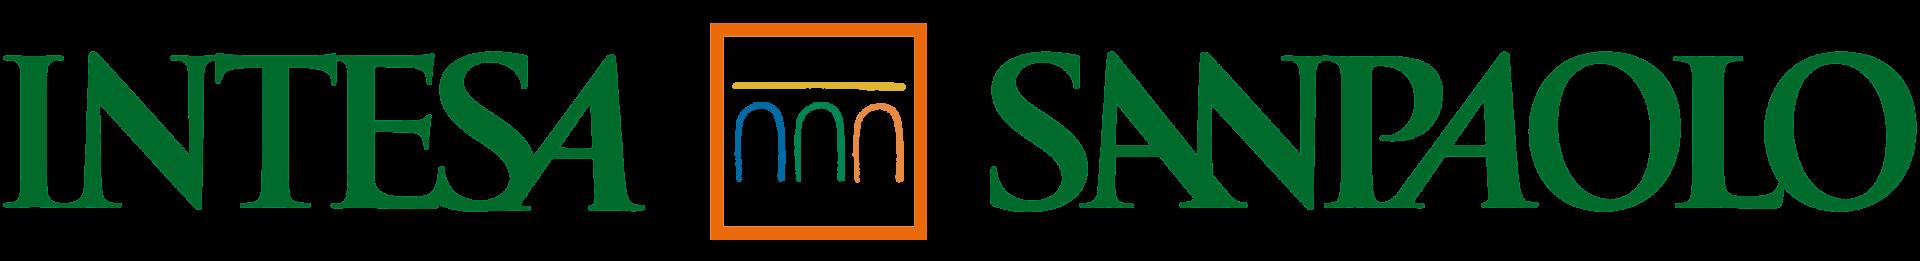 Intesa_Sanpaolo_logo_logotype